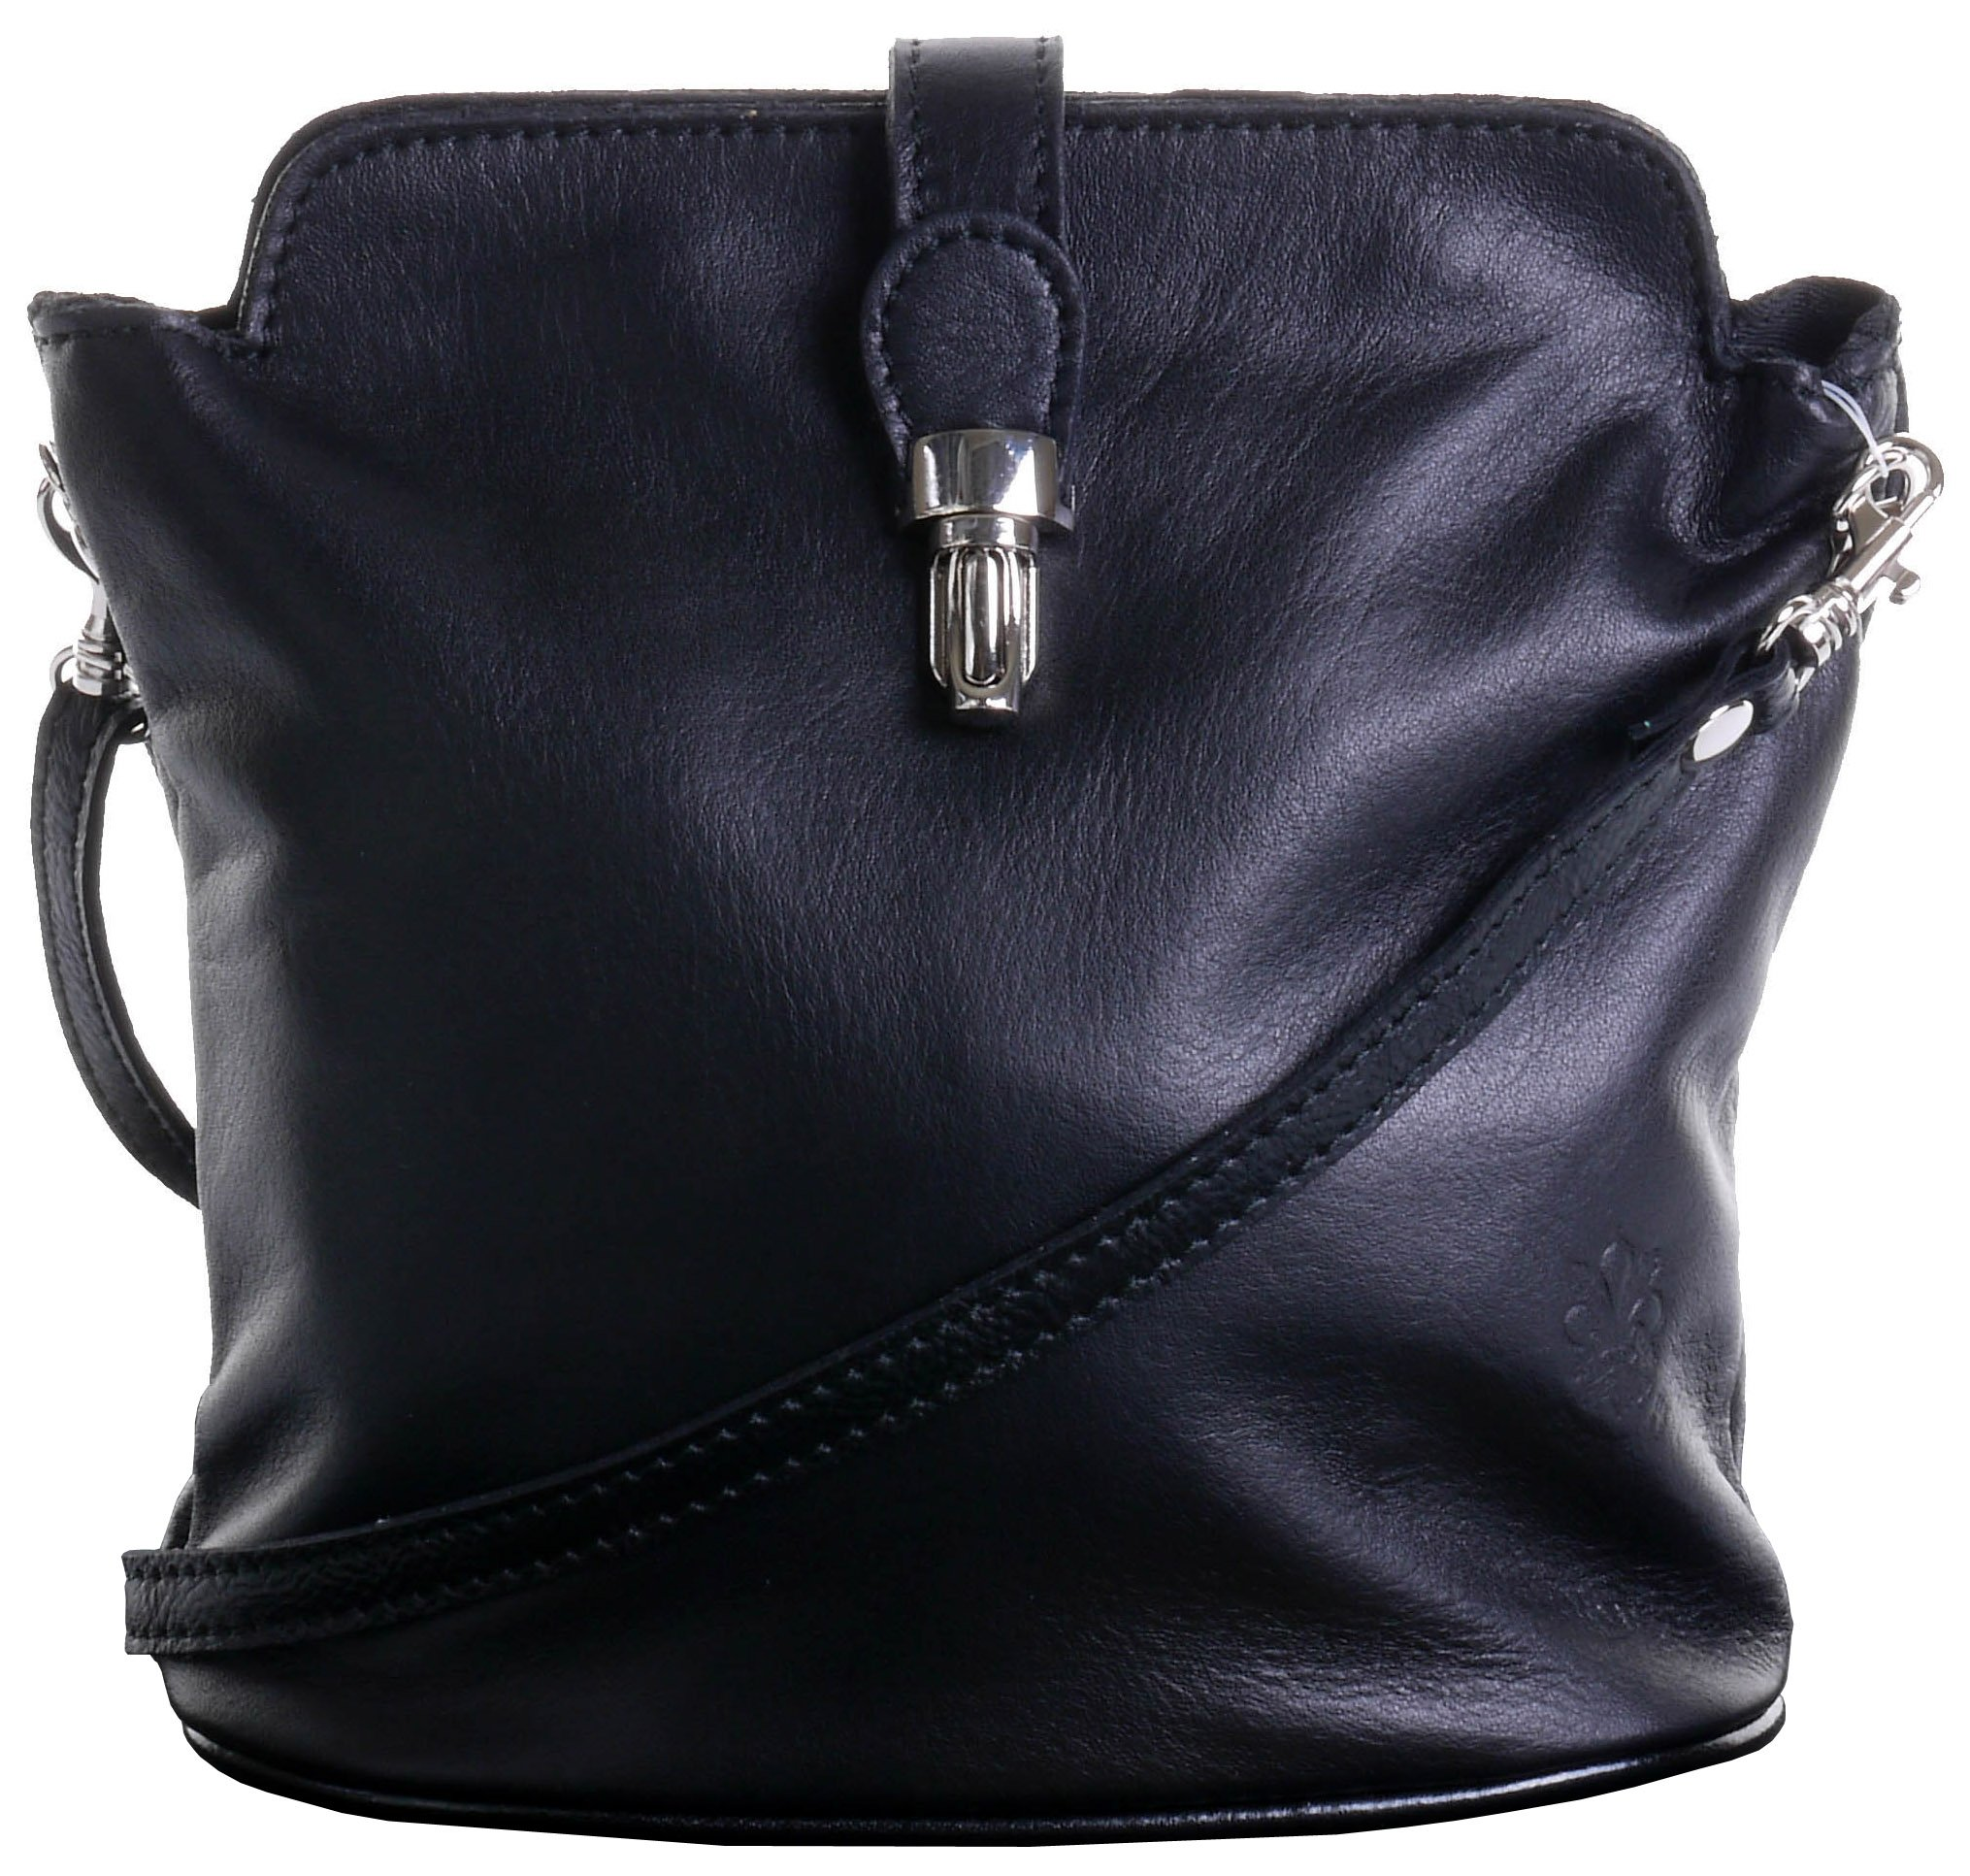 3472e3bd7b49 Primo Sacchi® Italian Leather Hand Made Adjustable Strap Cross Body or Shoulder  Bag Handbag.